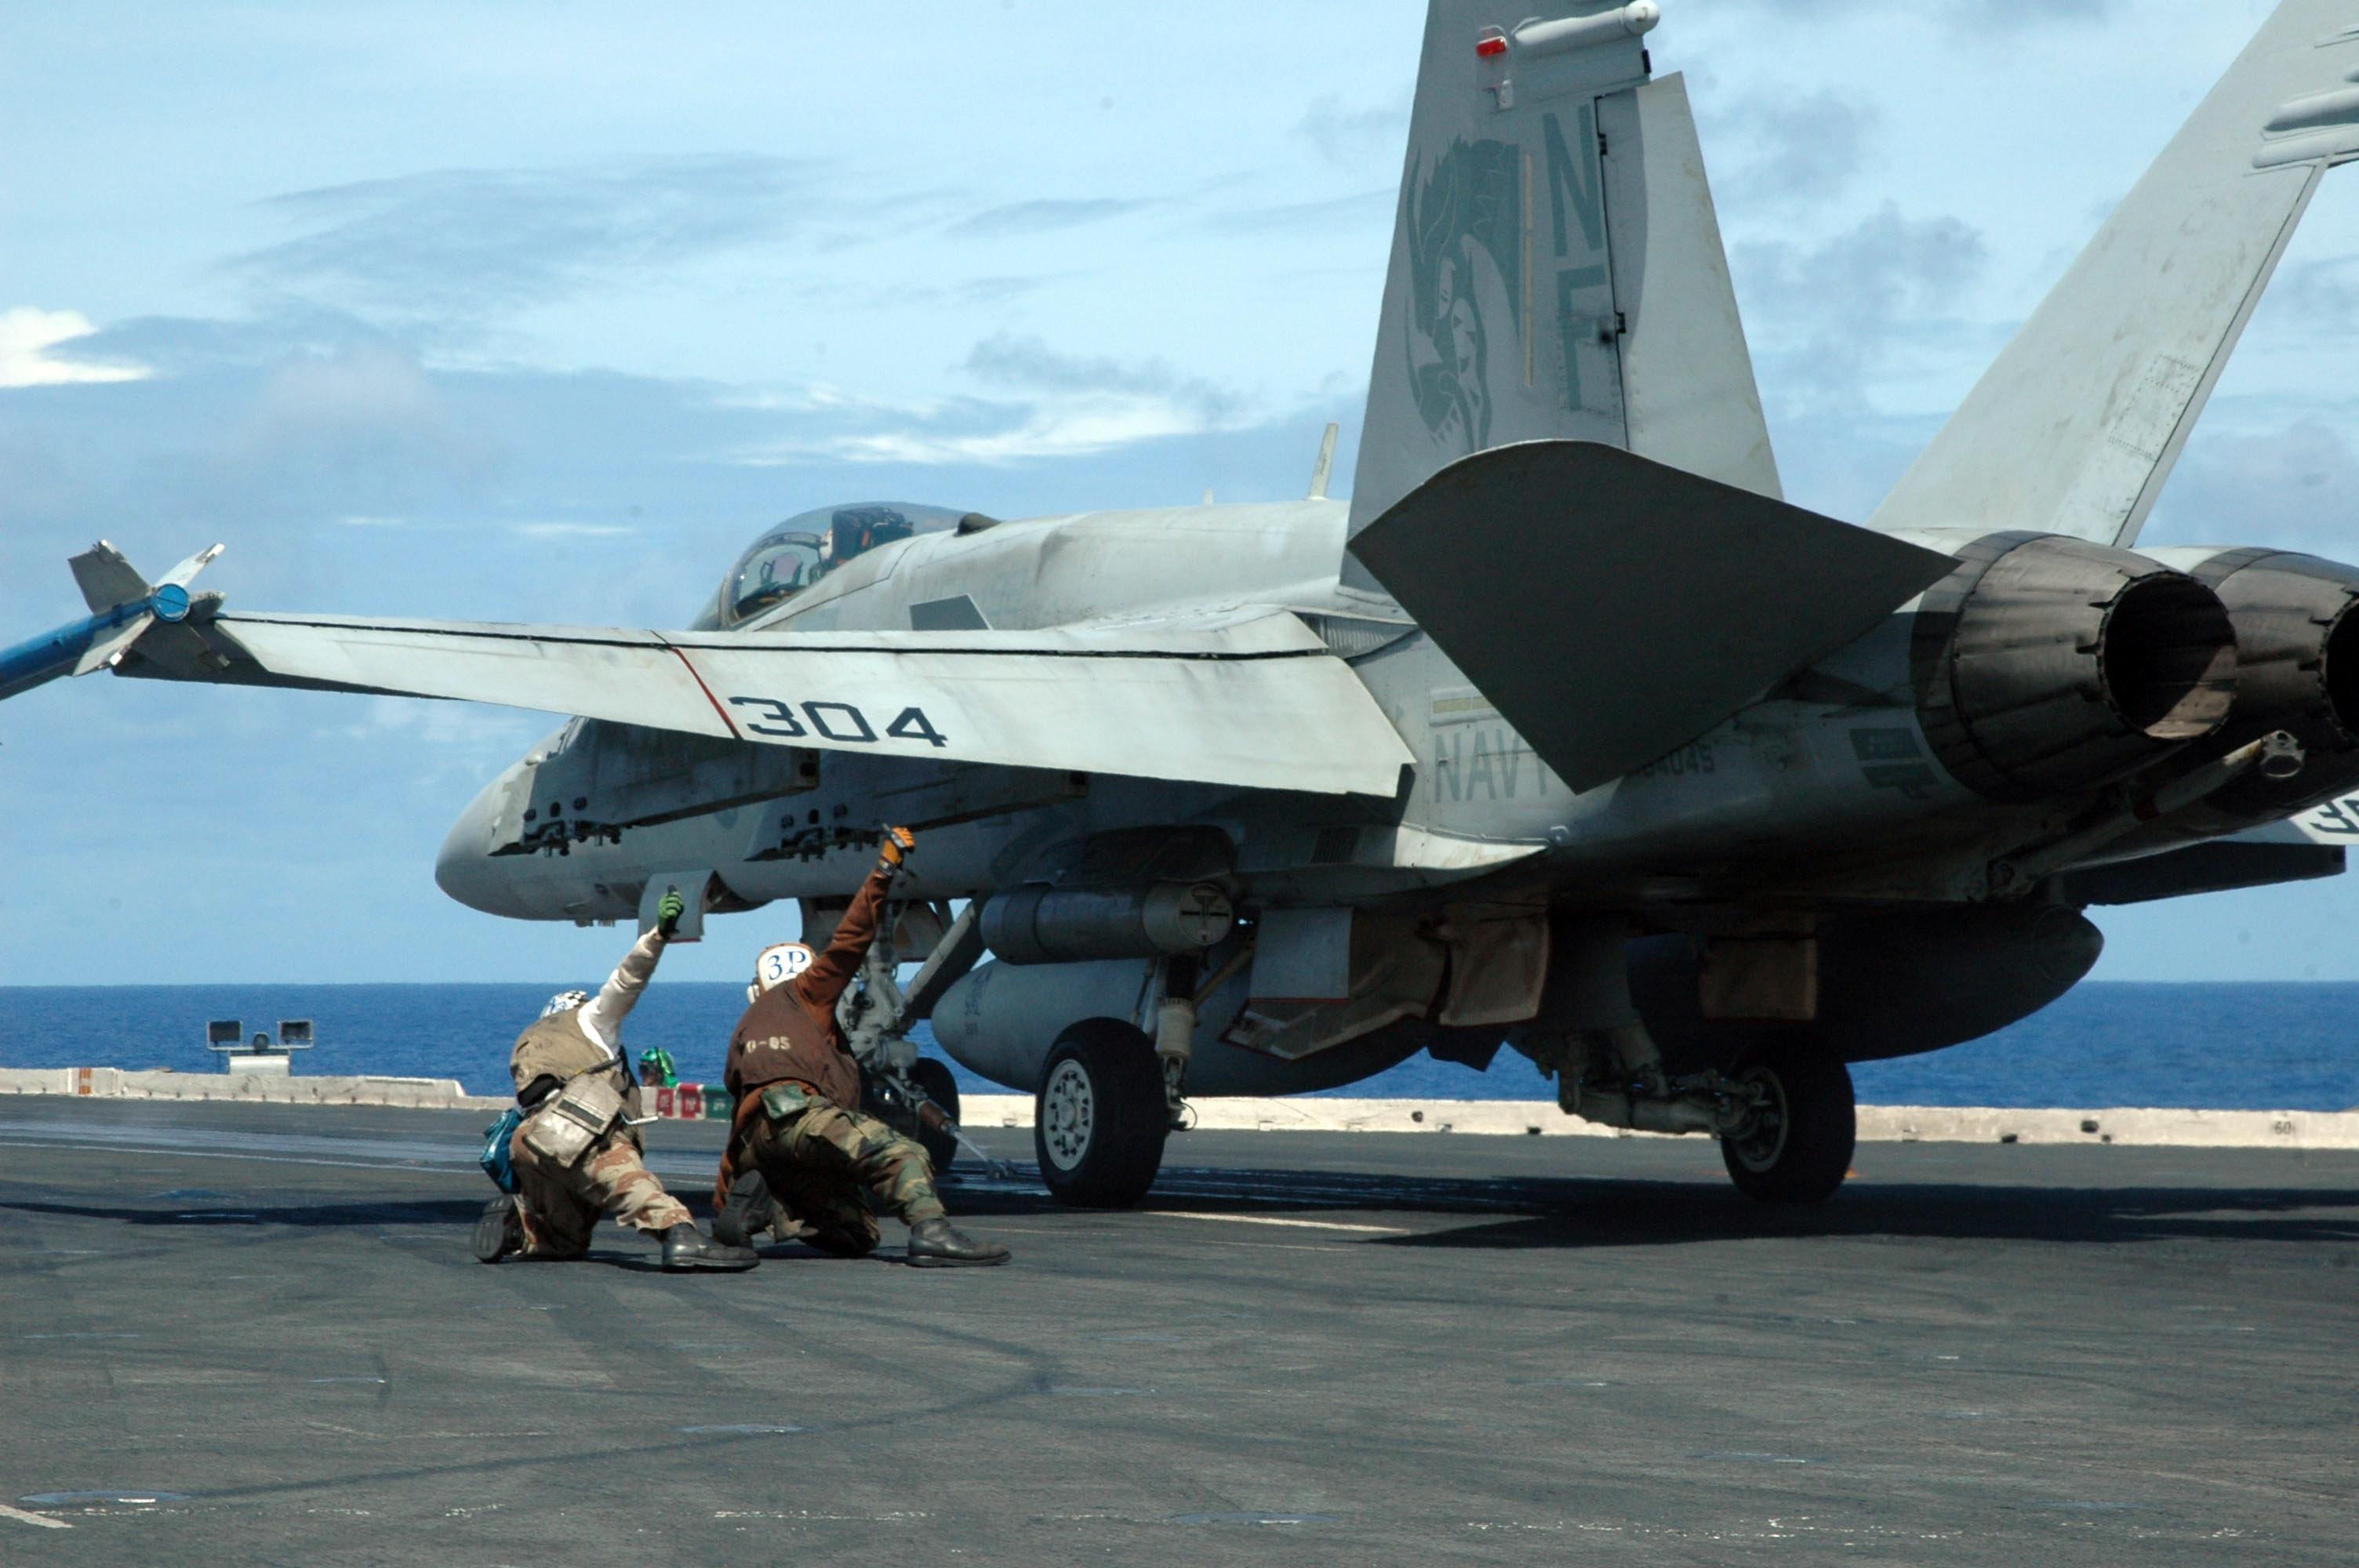 the flight deck of USS Kitty Hawk CV 63 during flight operationsjpg 3008x2000